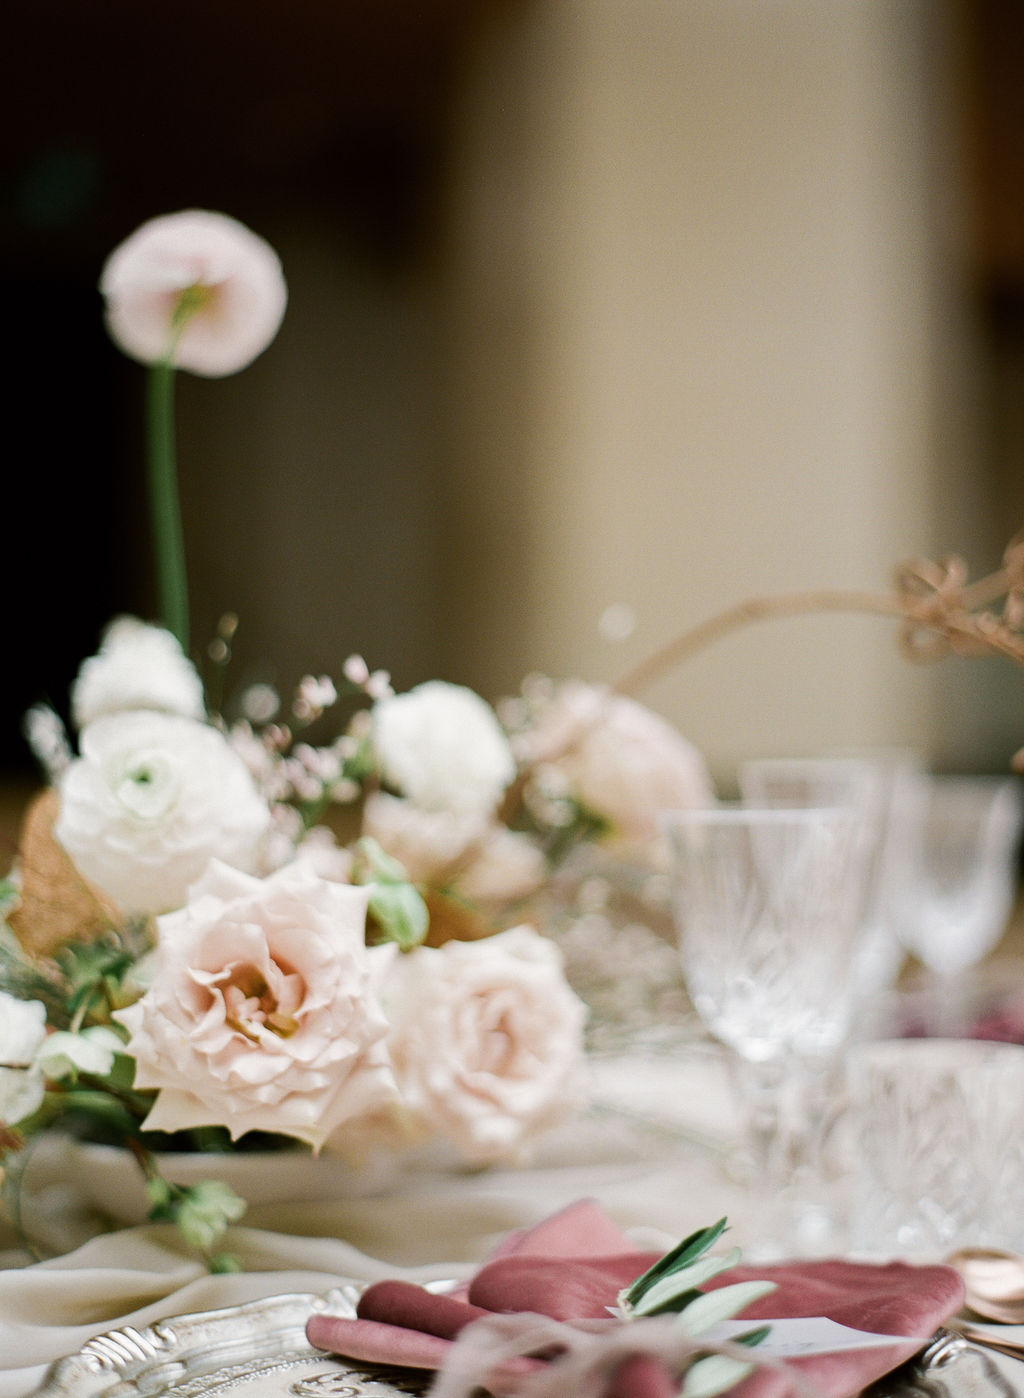 artiese-ago-wedding-editorial-000423610007.jpg